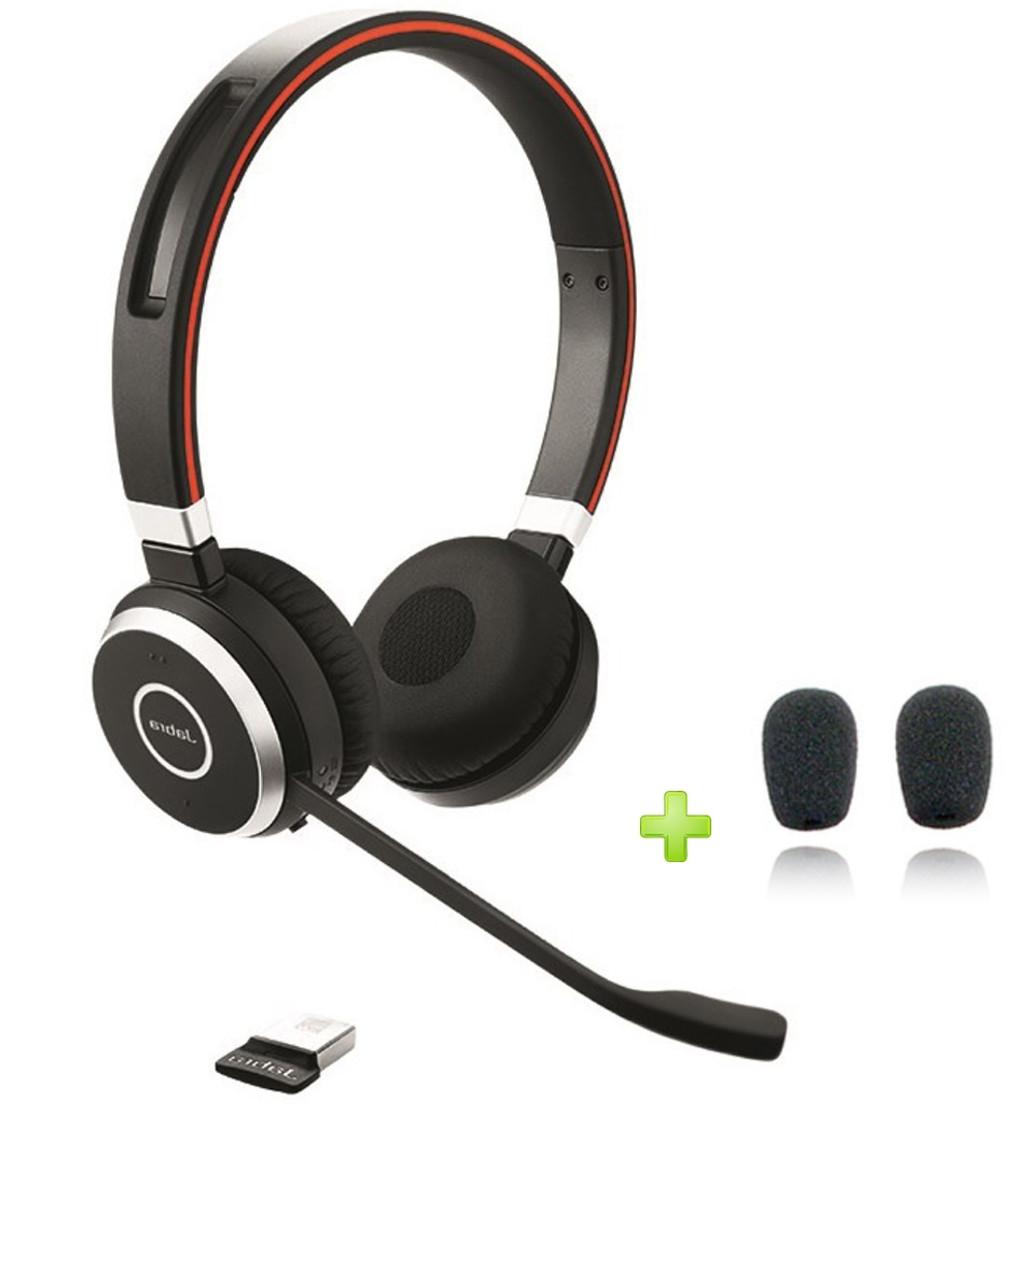 Jabra Evolve 65 Uc Stereo Bluetooth Headset Usb Bundle Windows Pc Mac Smartphone Streaming Music Skype Ip Communications 6599 829 409